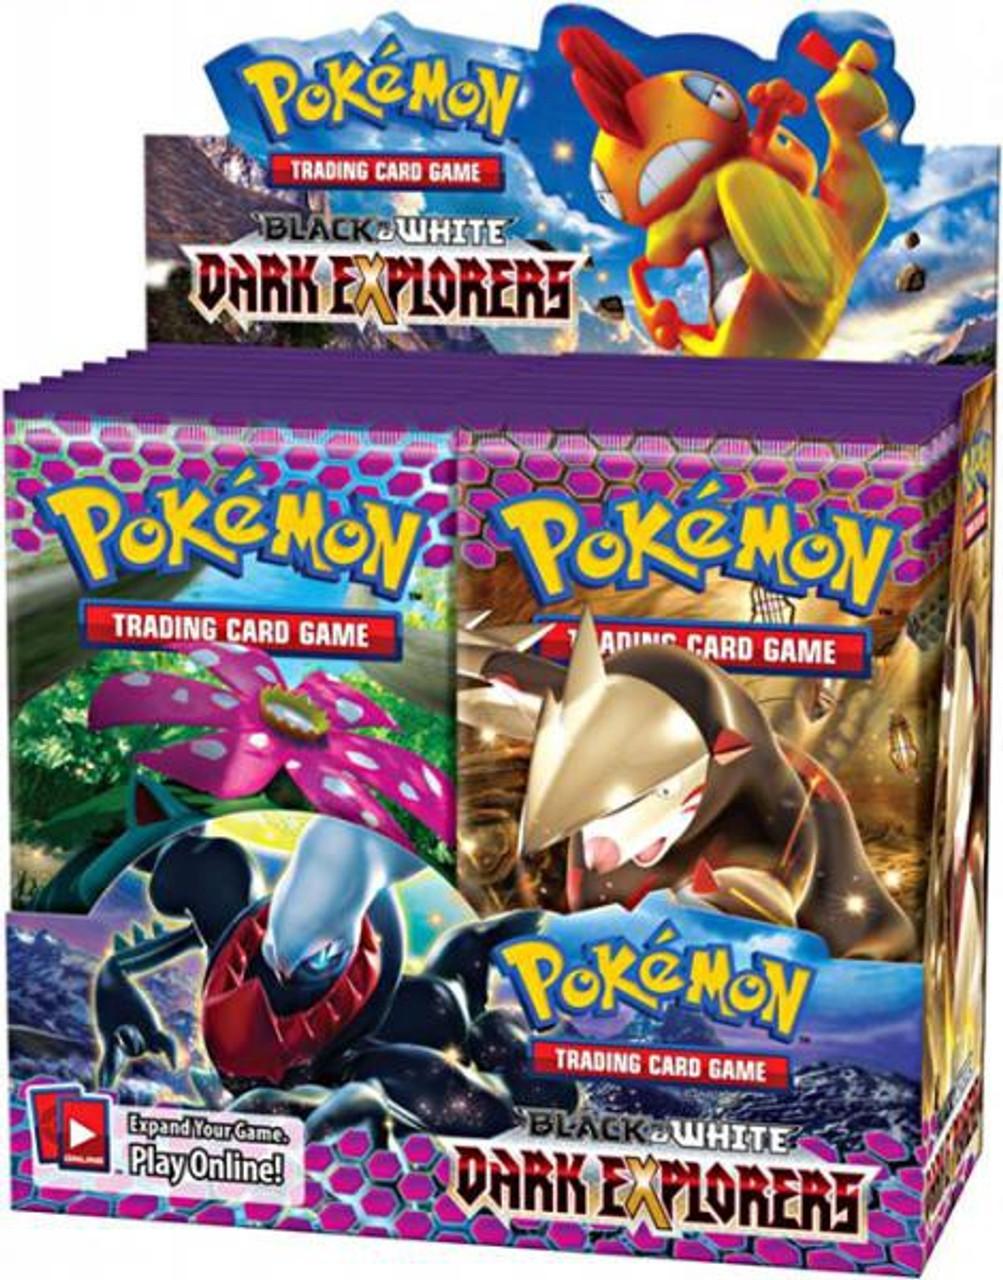 Pokemon Black & White Dark Explorers Booster Box [36 Packs]